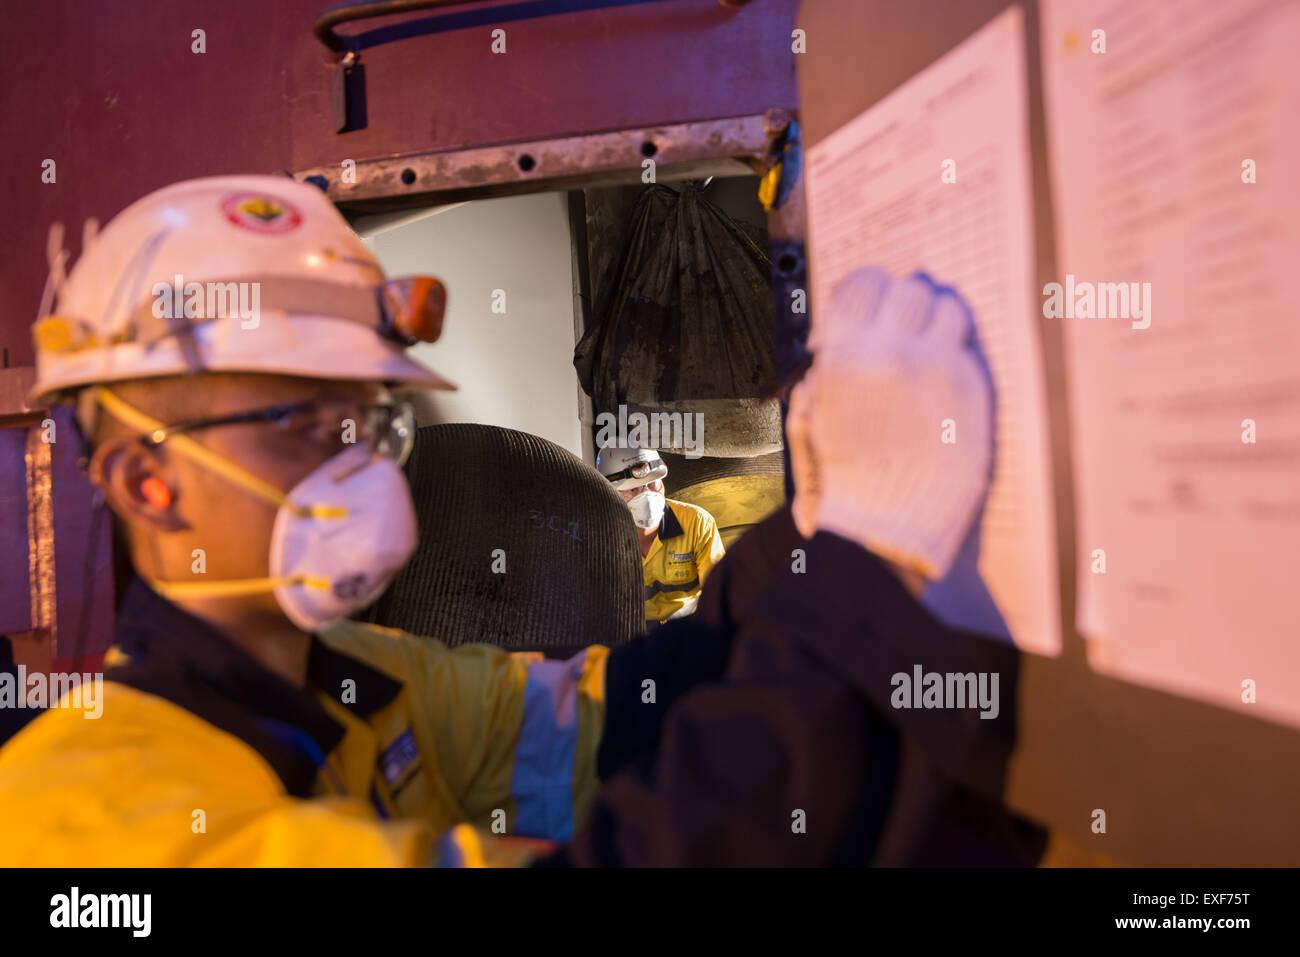 Power plant technician fills maintenance activity checklist form. © Reynold Sumayku - Stock Image